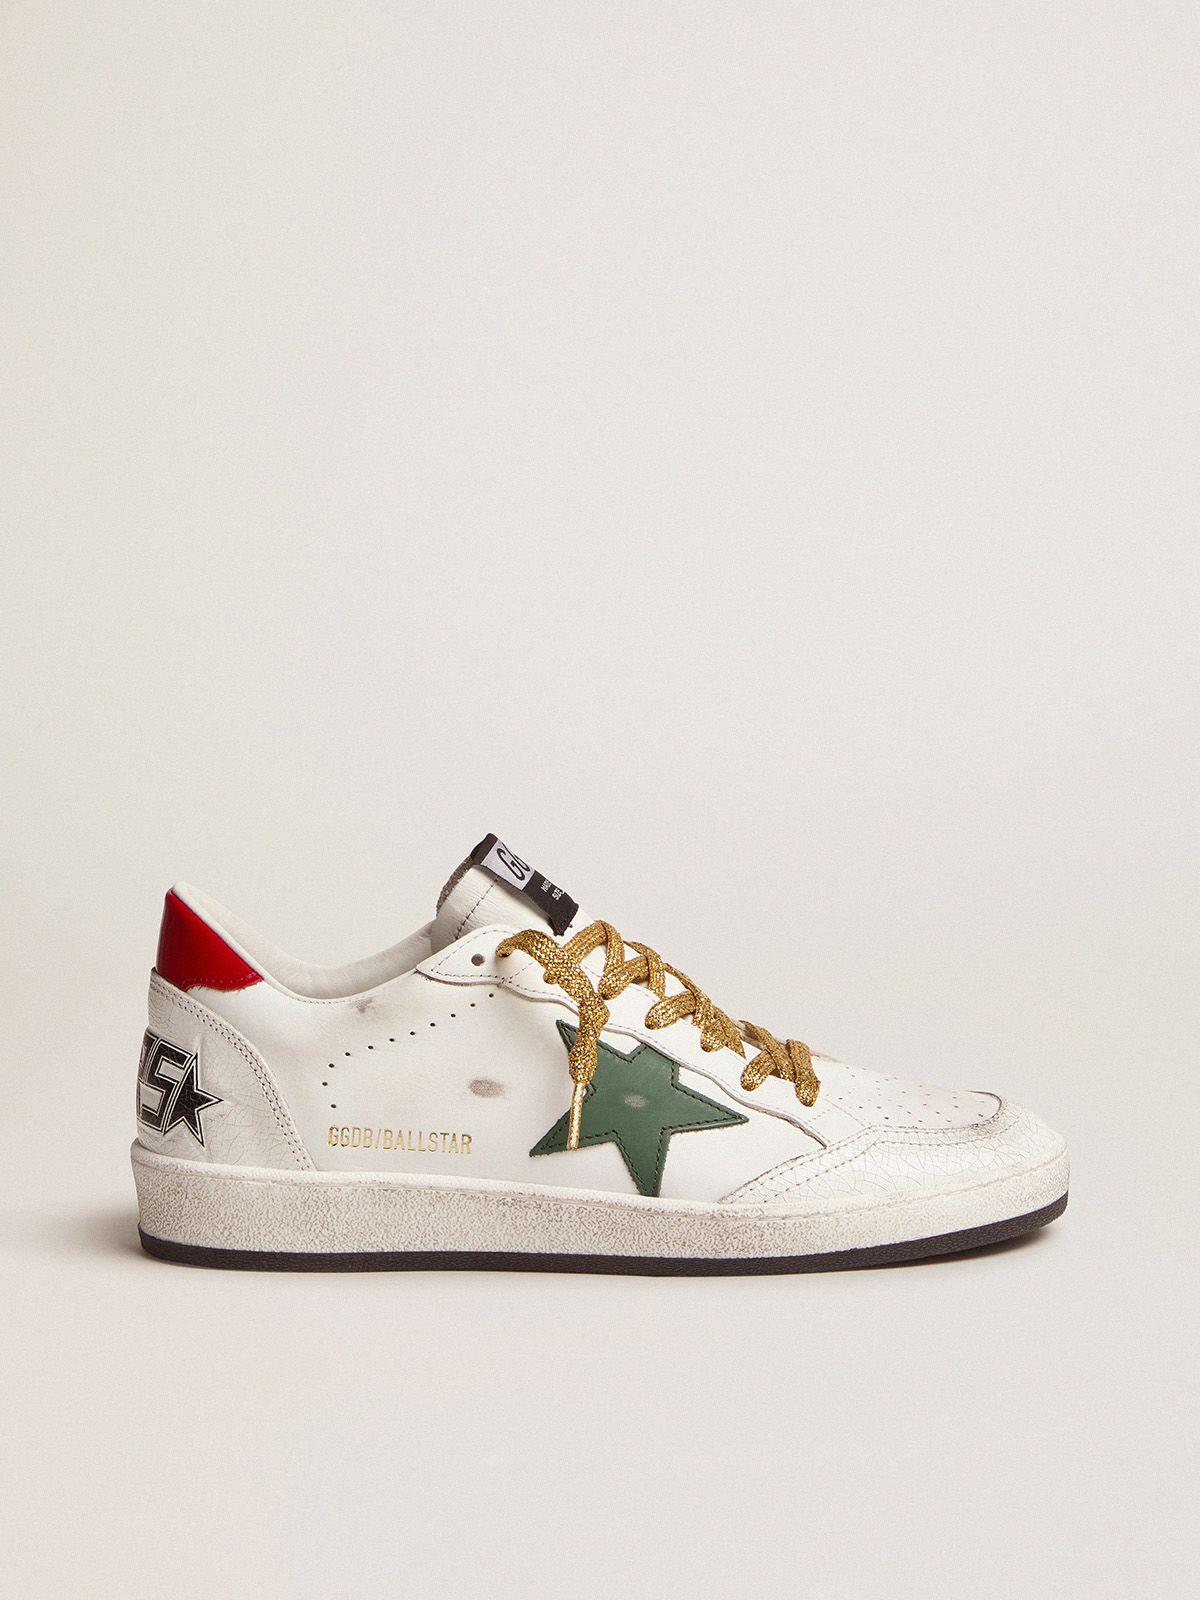 Golden Goose - Sneakers Ball Star con stella verde e talloncino rosso in